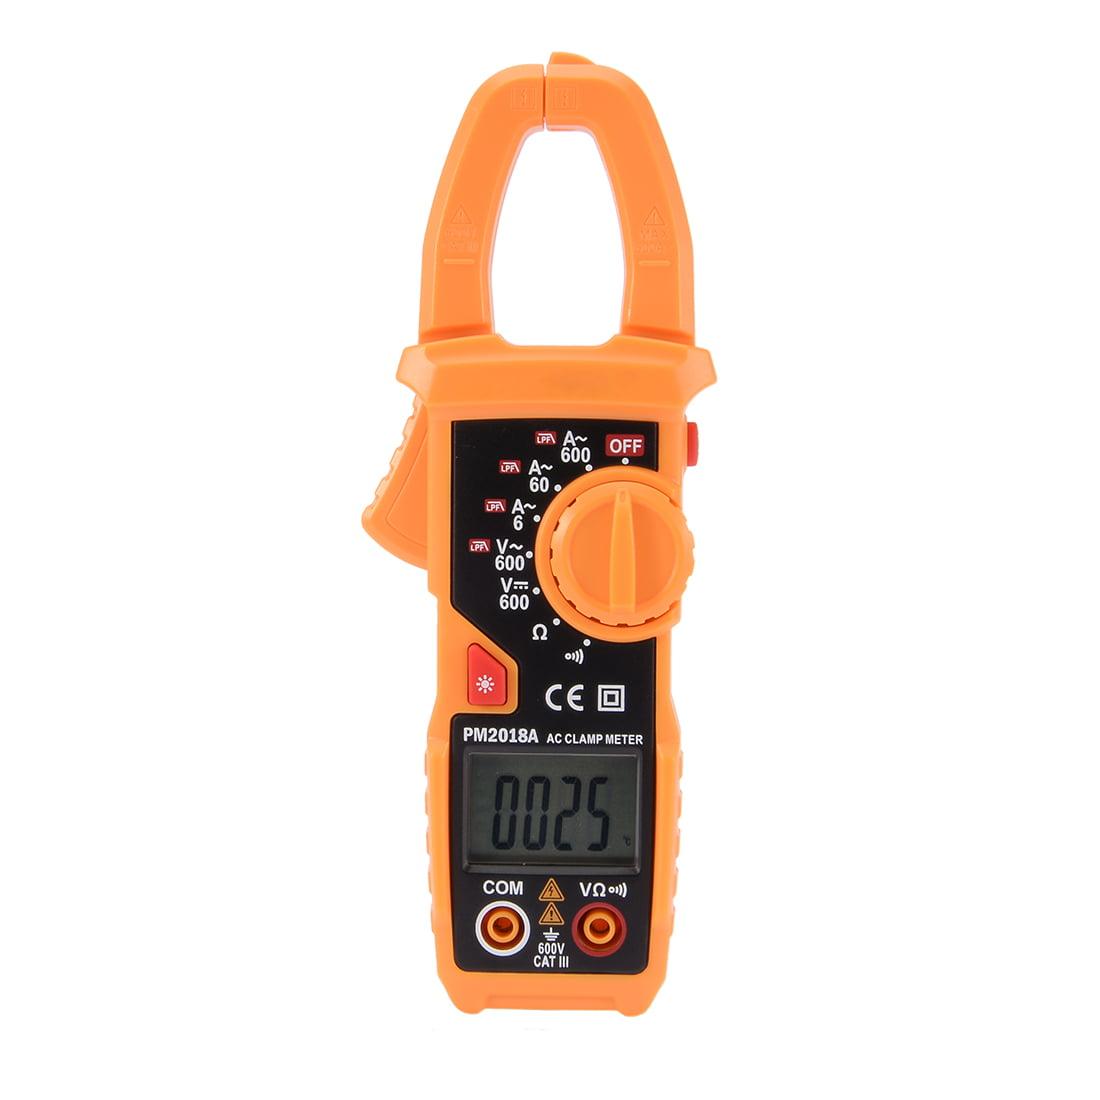 DMiotech PM2018A Digital Multimeter Ammeter Voltage Ohmmeter Clamp Meter Tester by Unique-Bargains